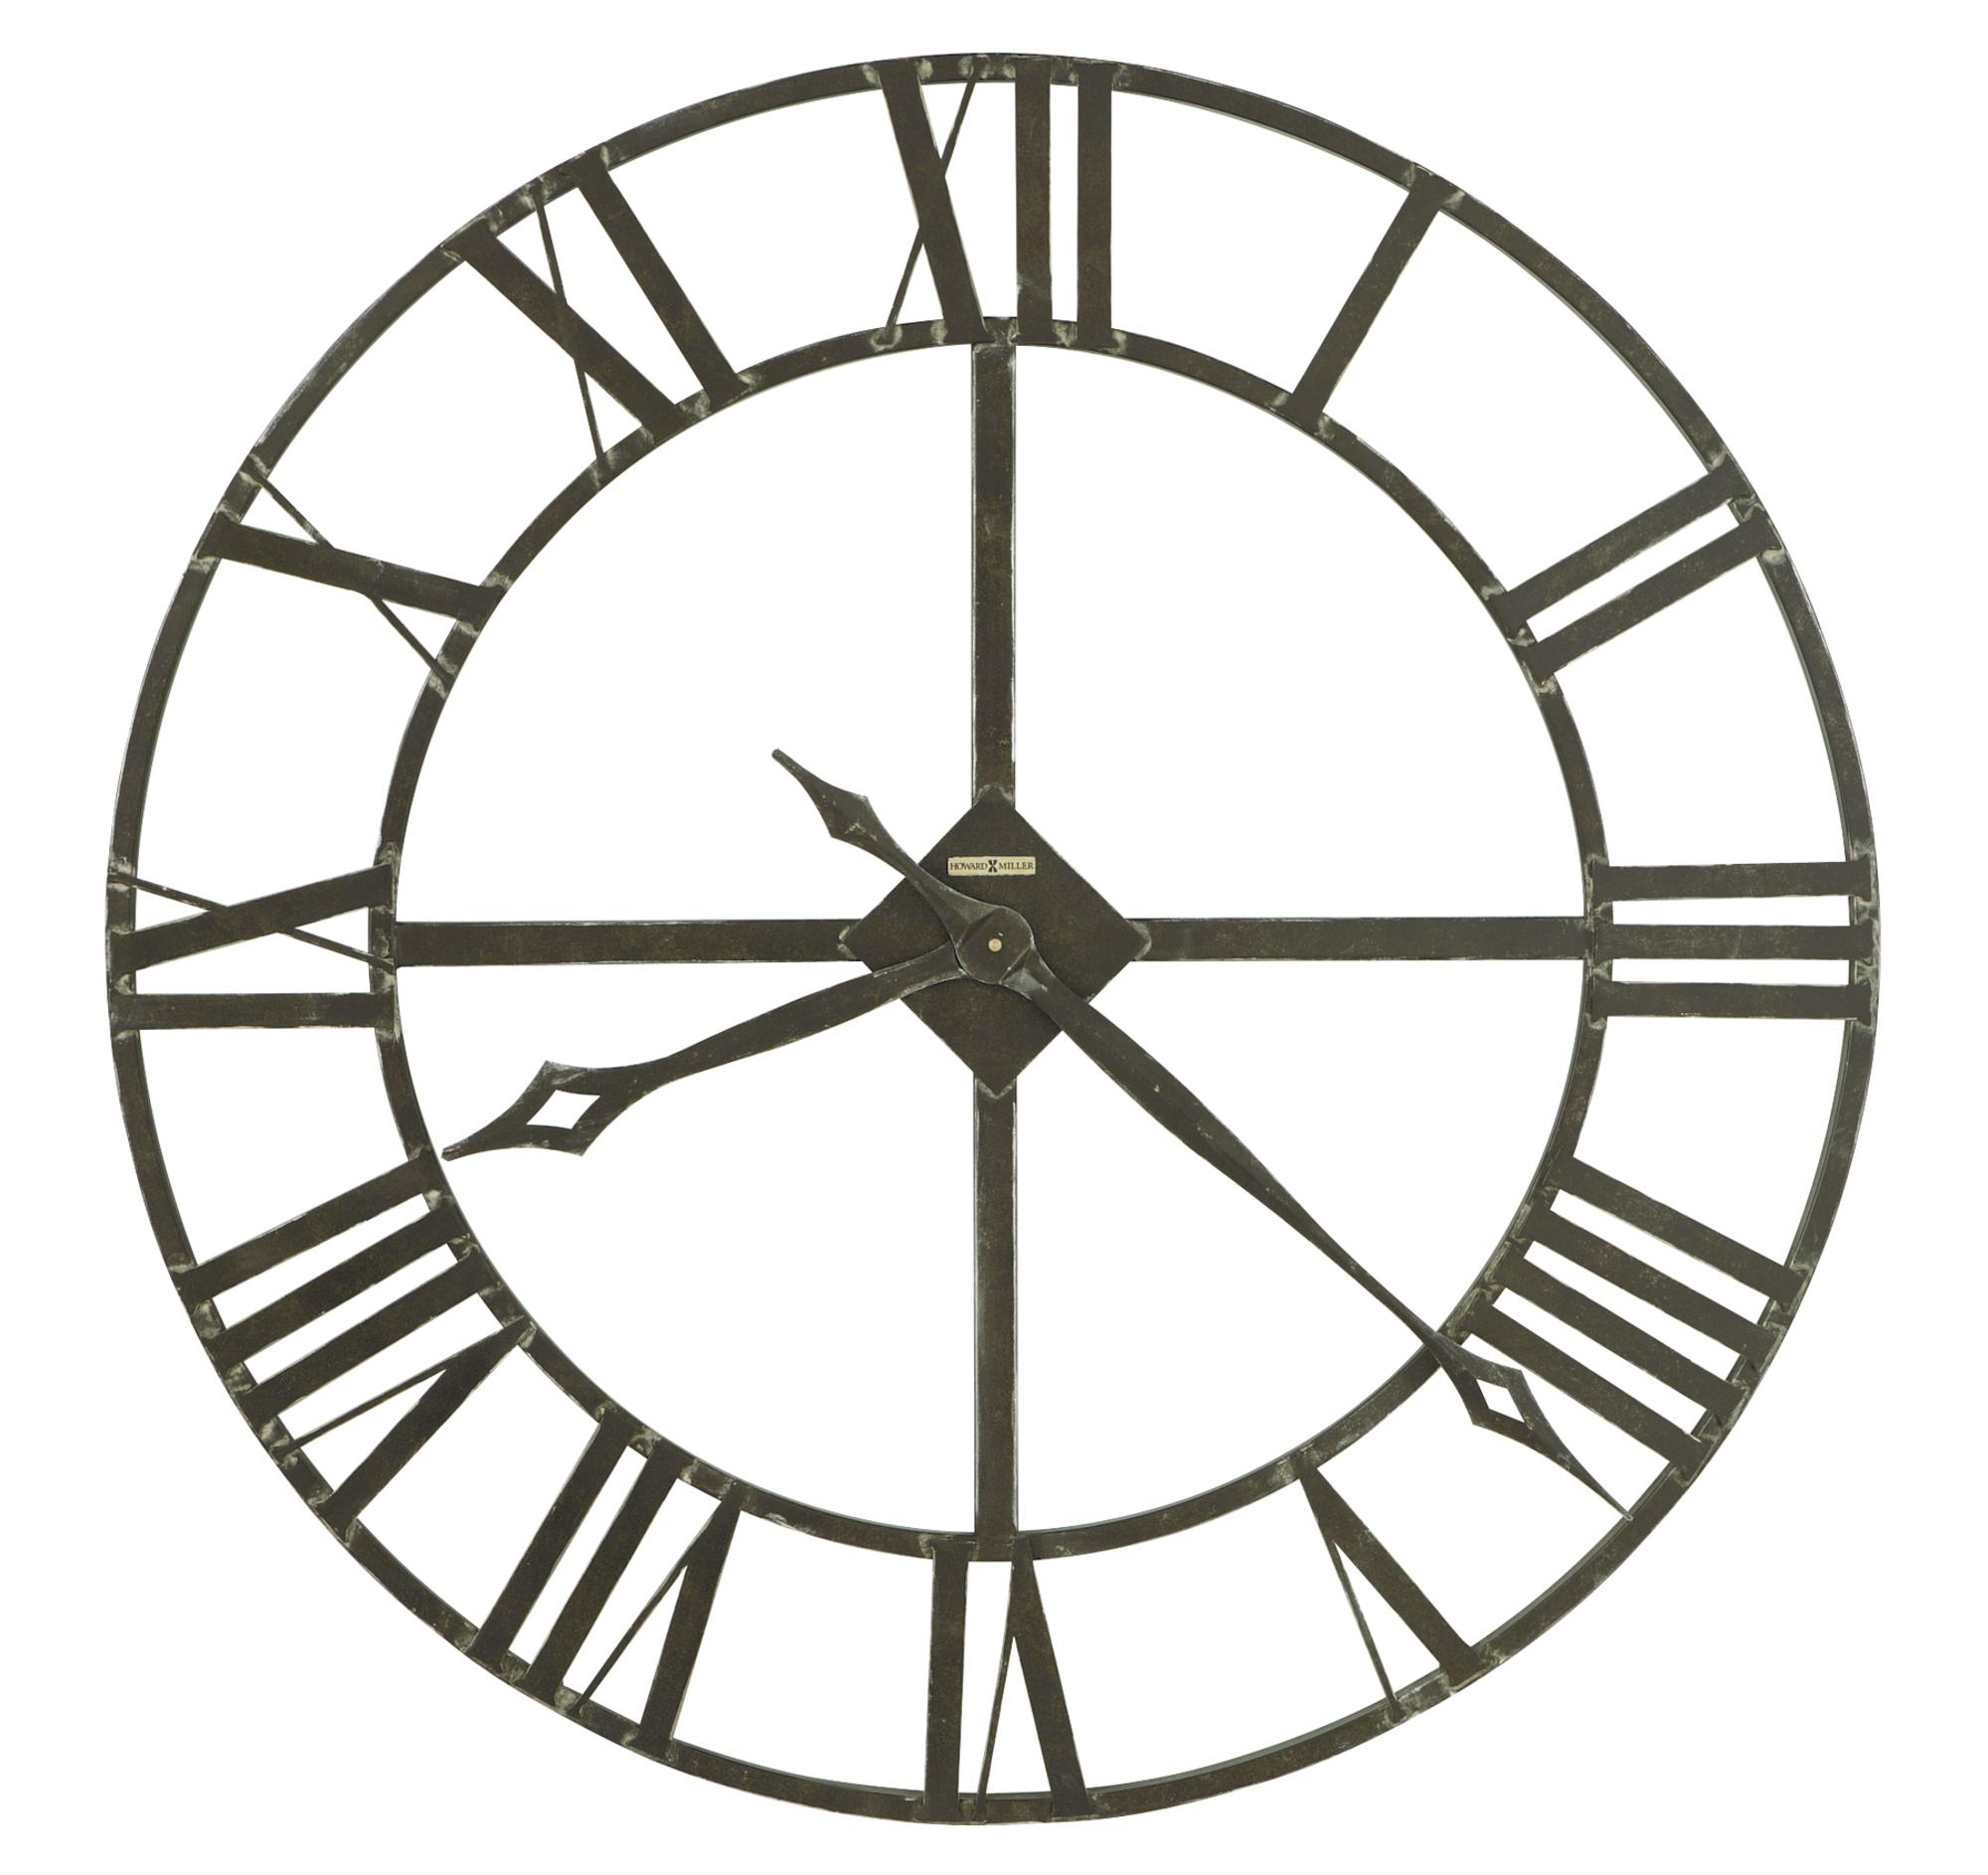 Howard miller lacy ii 14 inch wall clock at 1 800 4clocks howard miller lacy ii 14 inch wall clock amipublicfo Choice Image